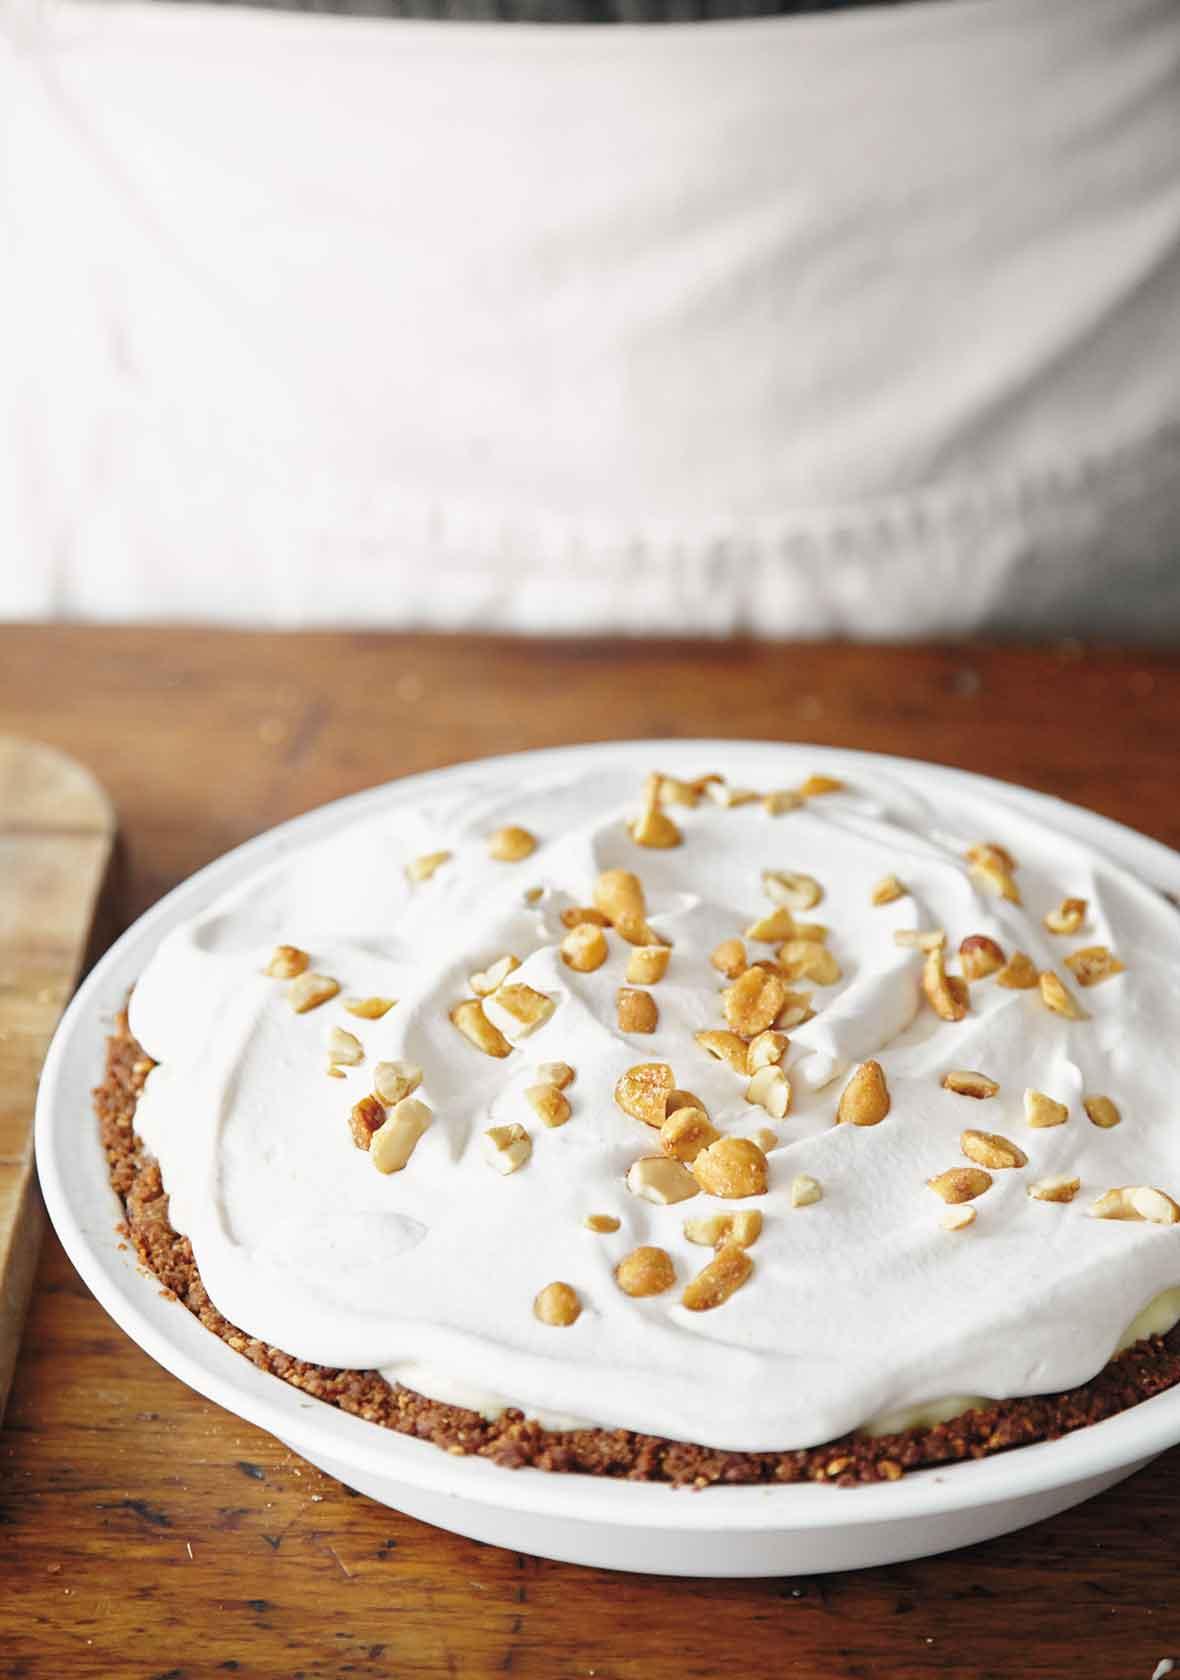 Peanut Butter Pie (aka Elvis Pie)